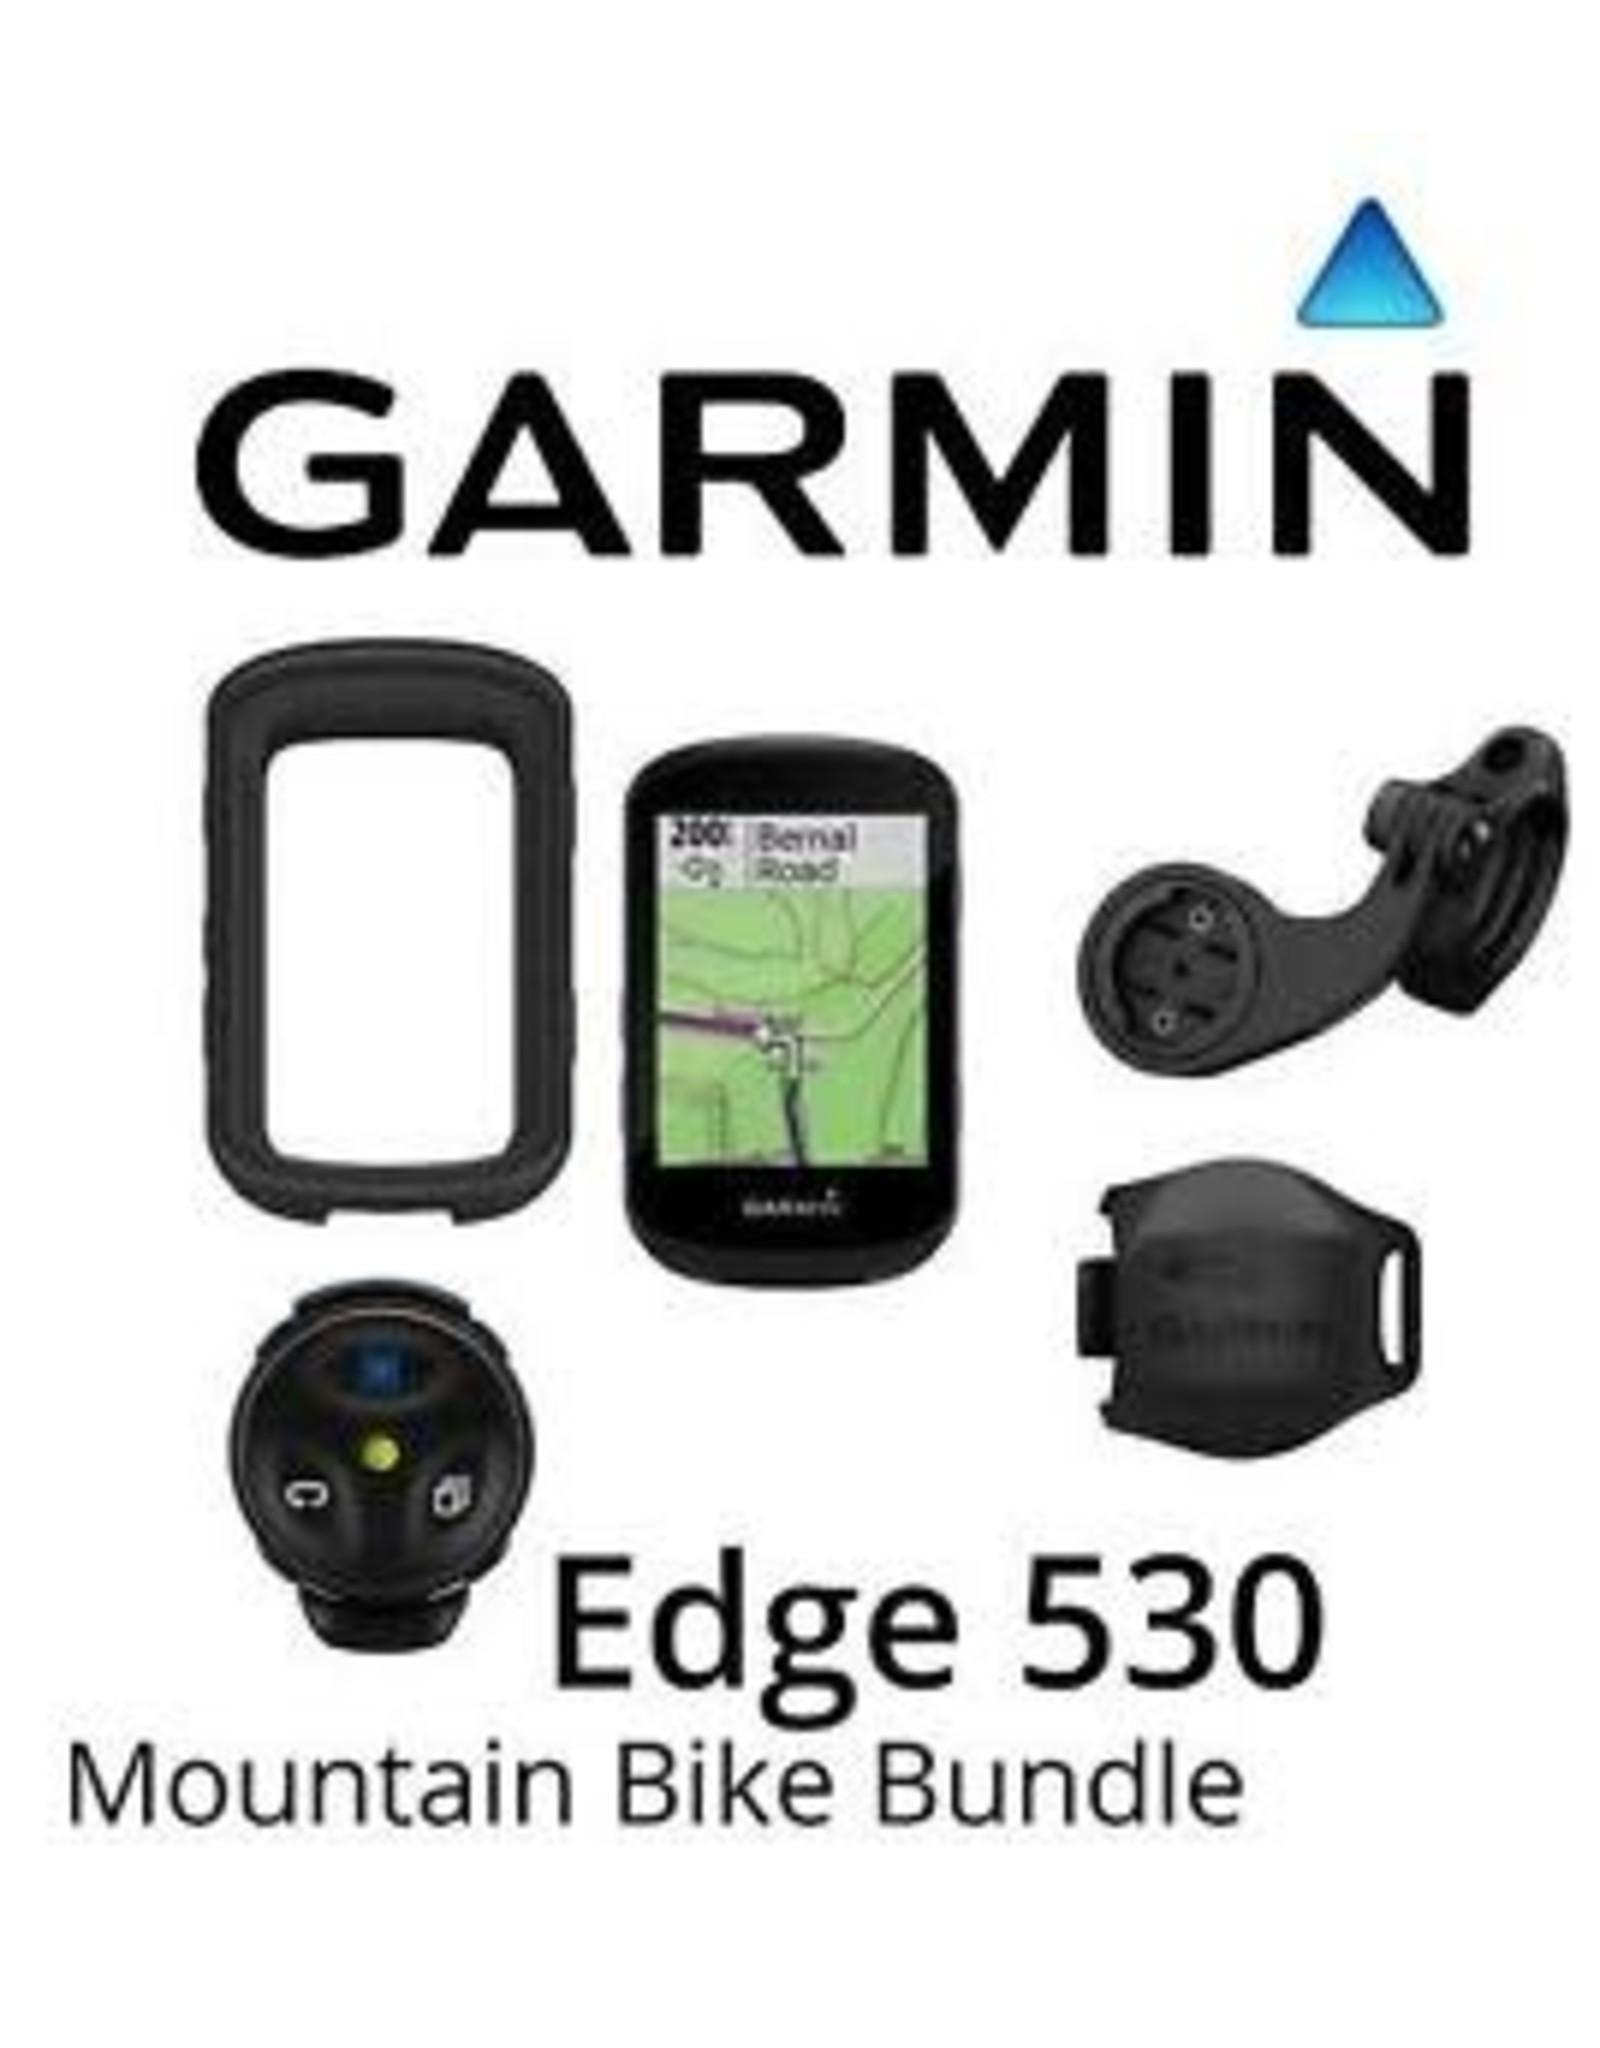 Garmin Edge 530 Mountain Bike Bundle DEMO